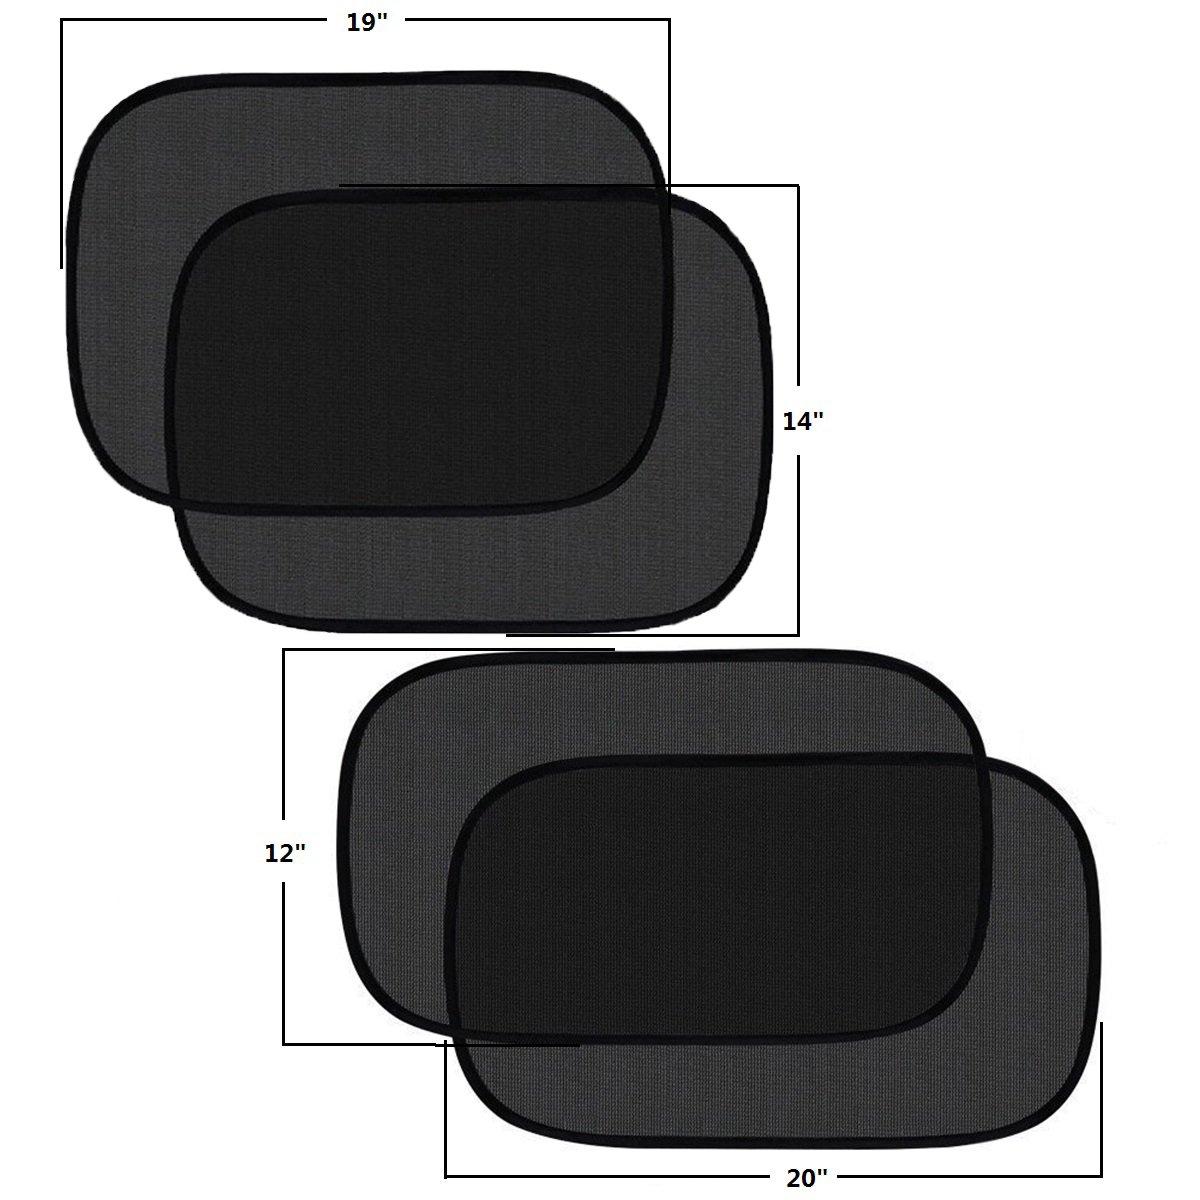 Baby Side Window Car Sun Shades 20x 12 and 19x 14 20x12/&19x14 Sunshade for Car Side Window Clings 80GSM UPF50+ Blocks Over 99/% of Harmful UV Rays Pulaisen Car Window Shade